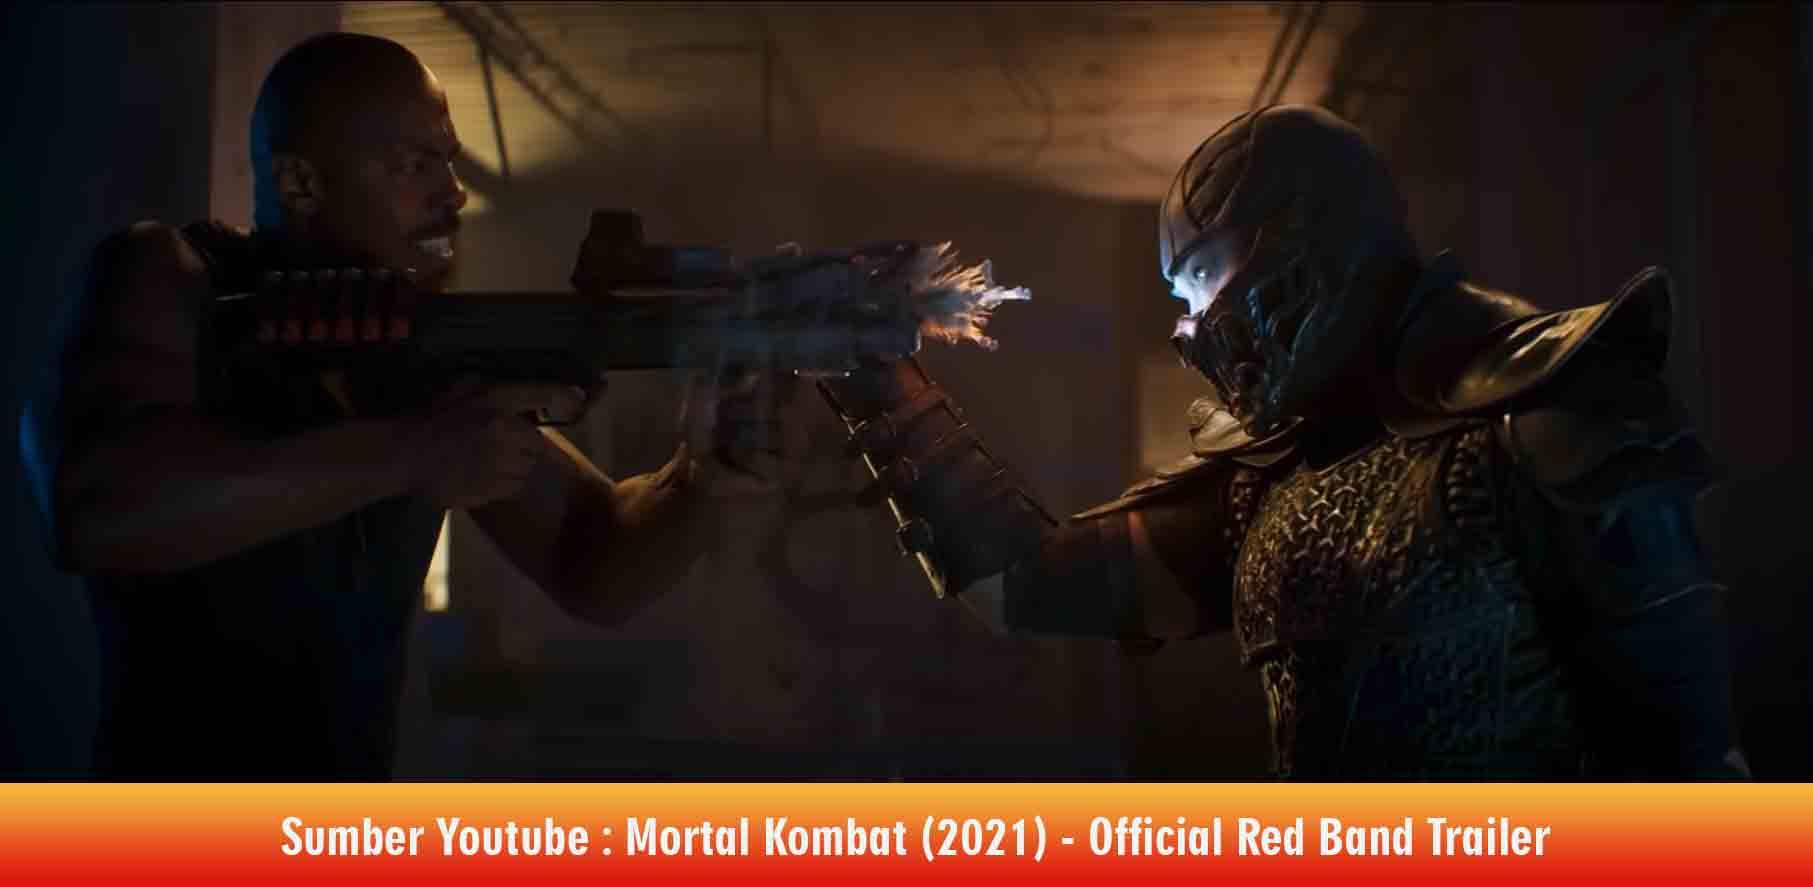 Trailer Mortal Kombat 2021